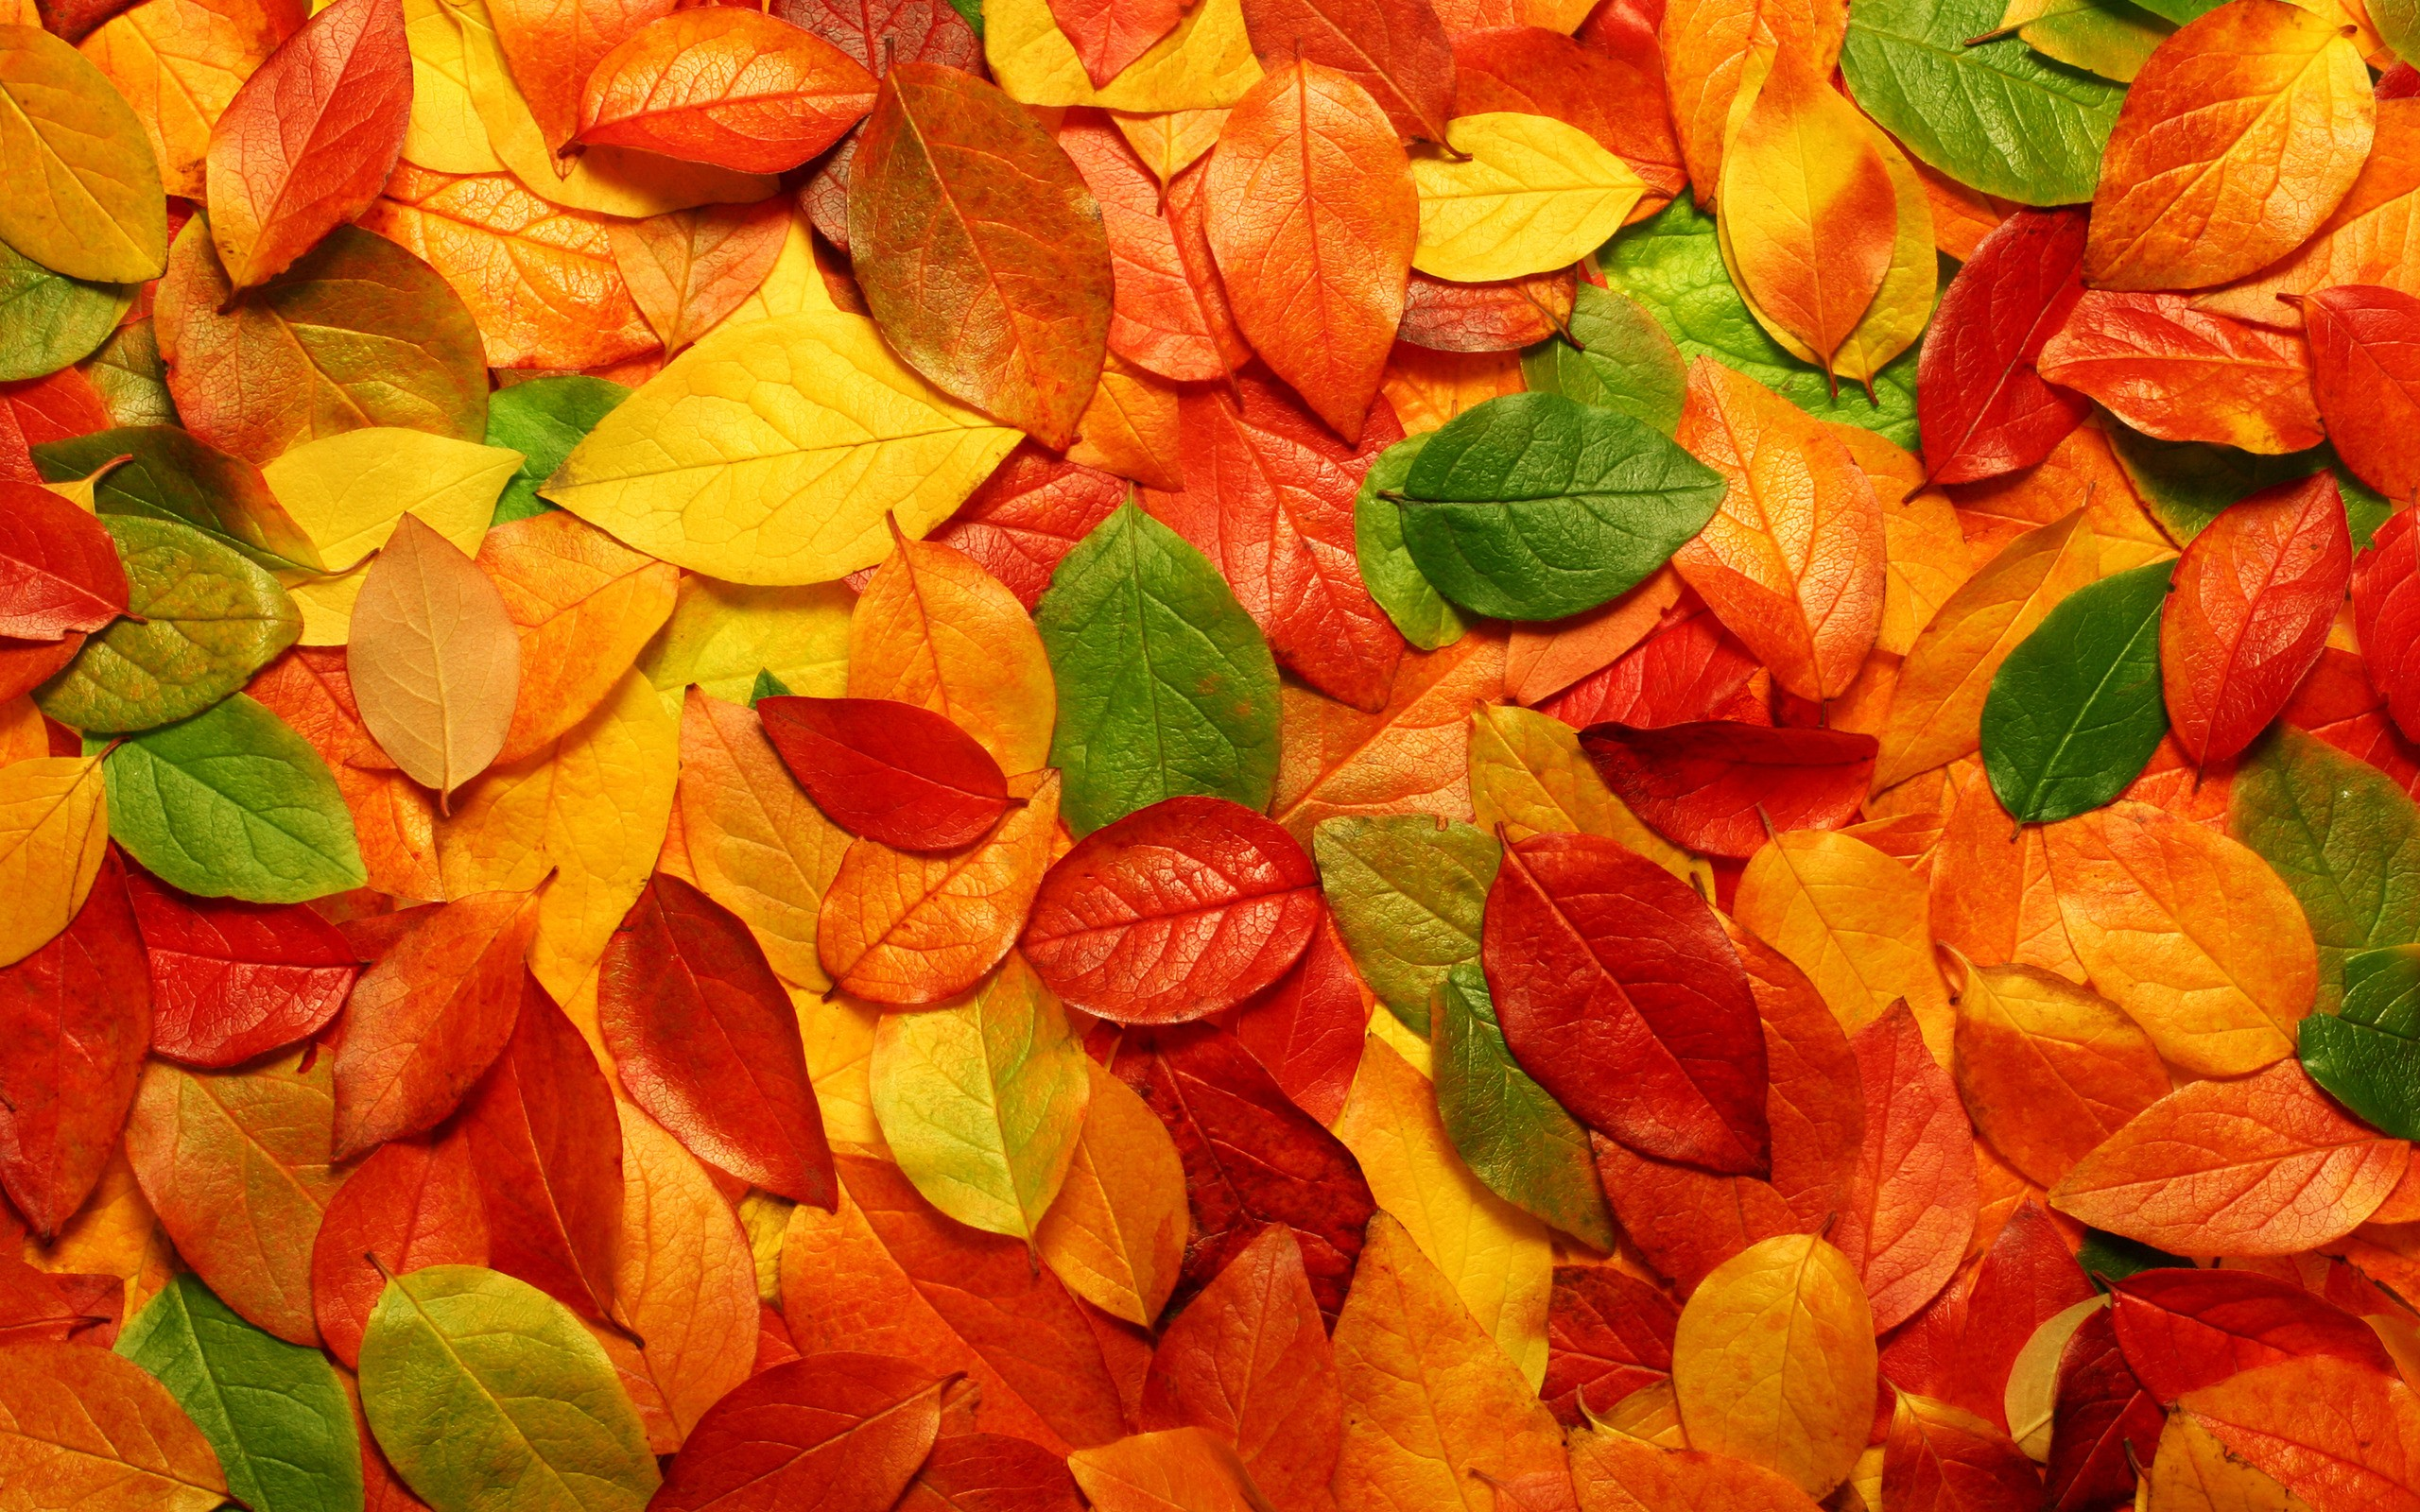 Textura de hojas - 2560x1600